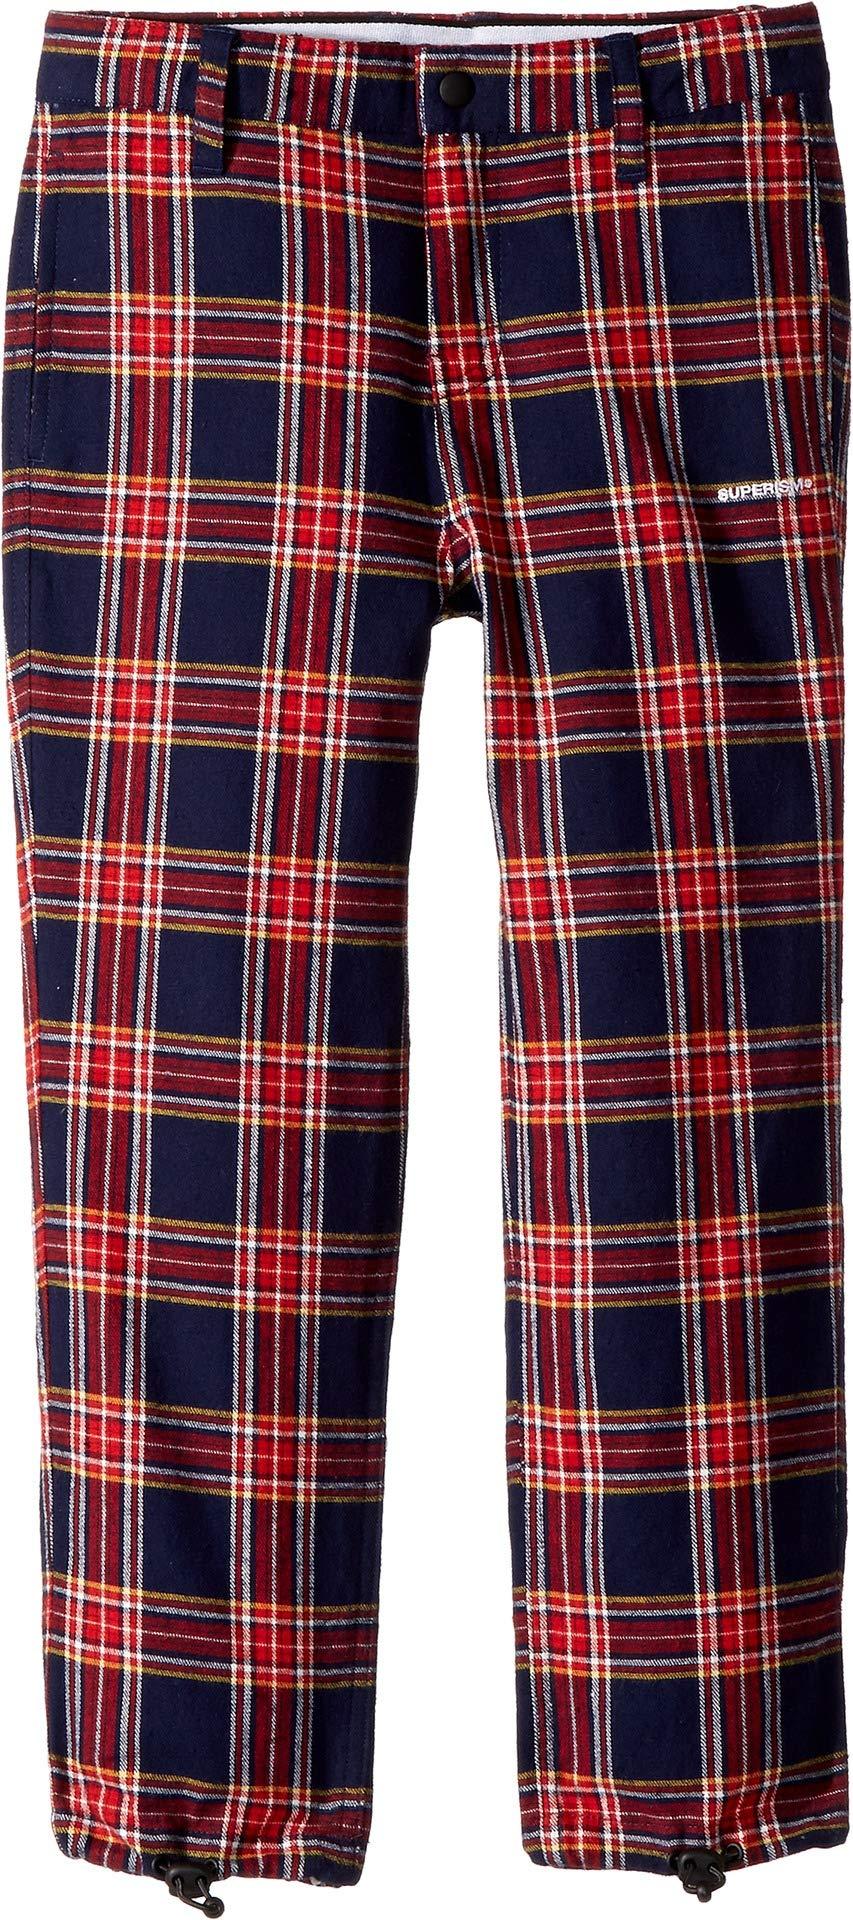 SUPERISM Baby Boy's Jamison Flannel Pants (Toddler/Little Kids/Big Kids) Navy 10